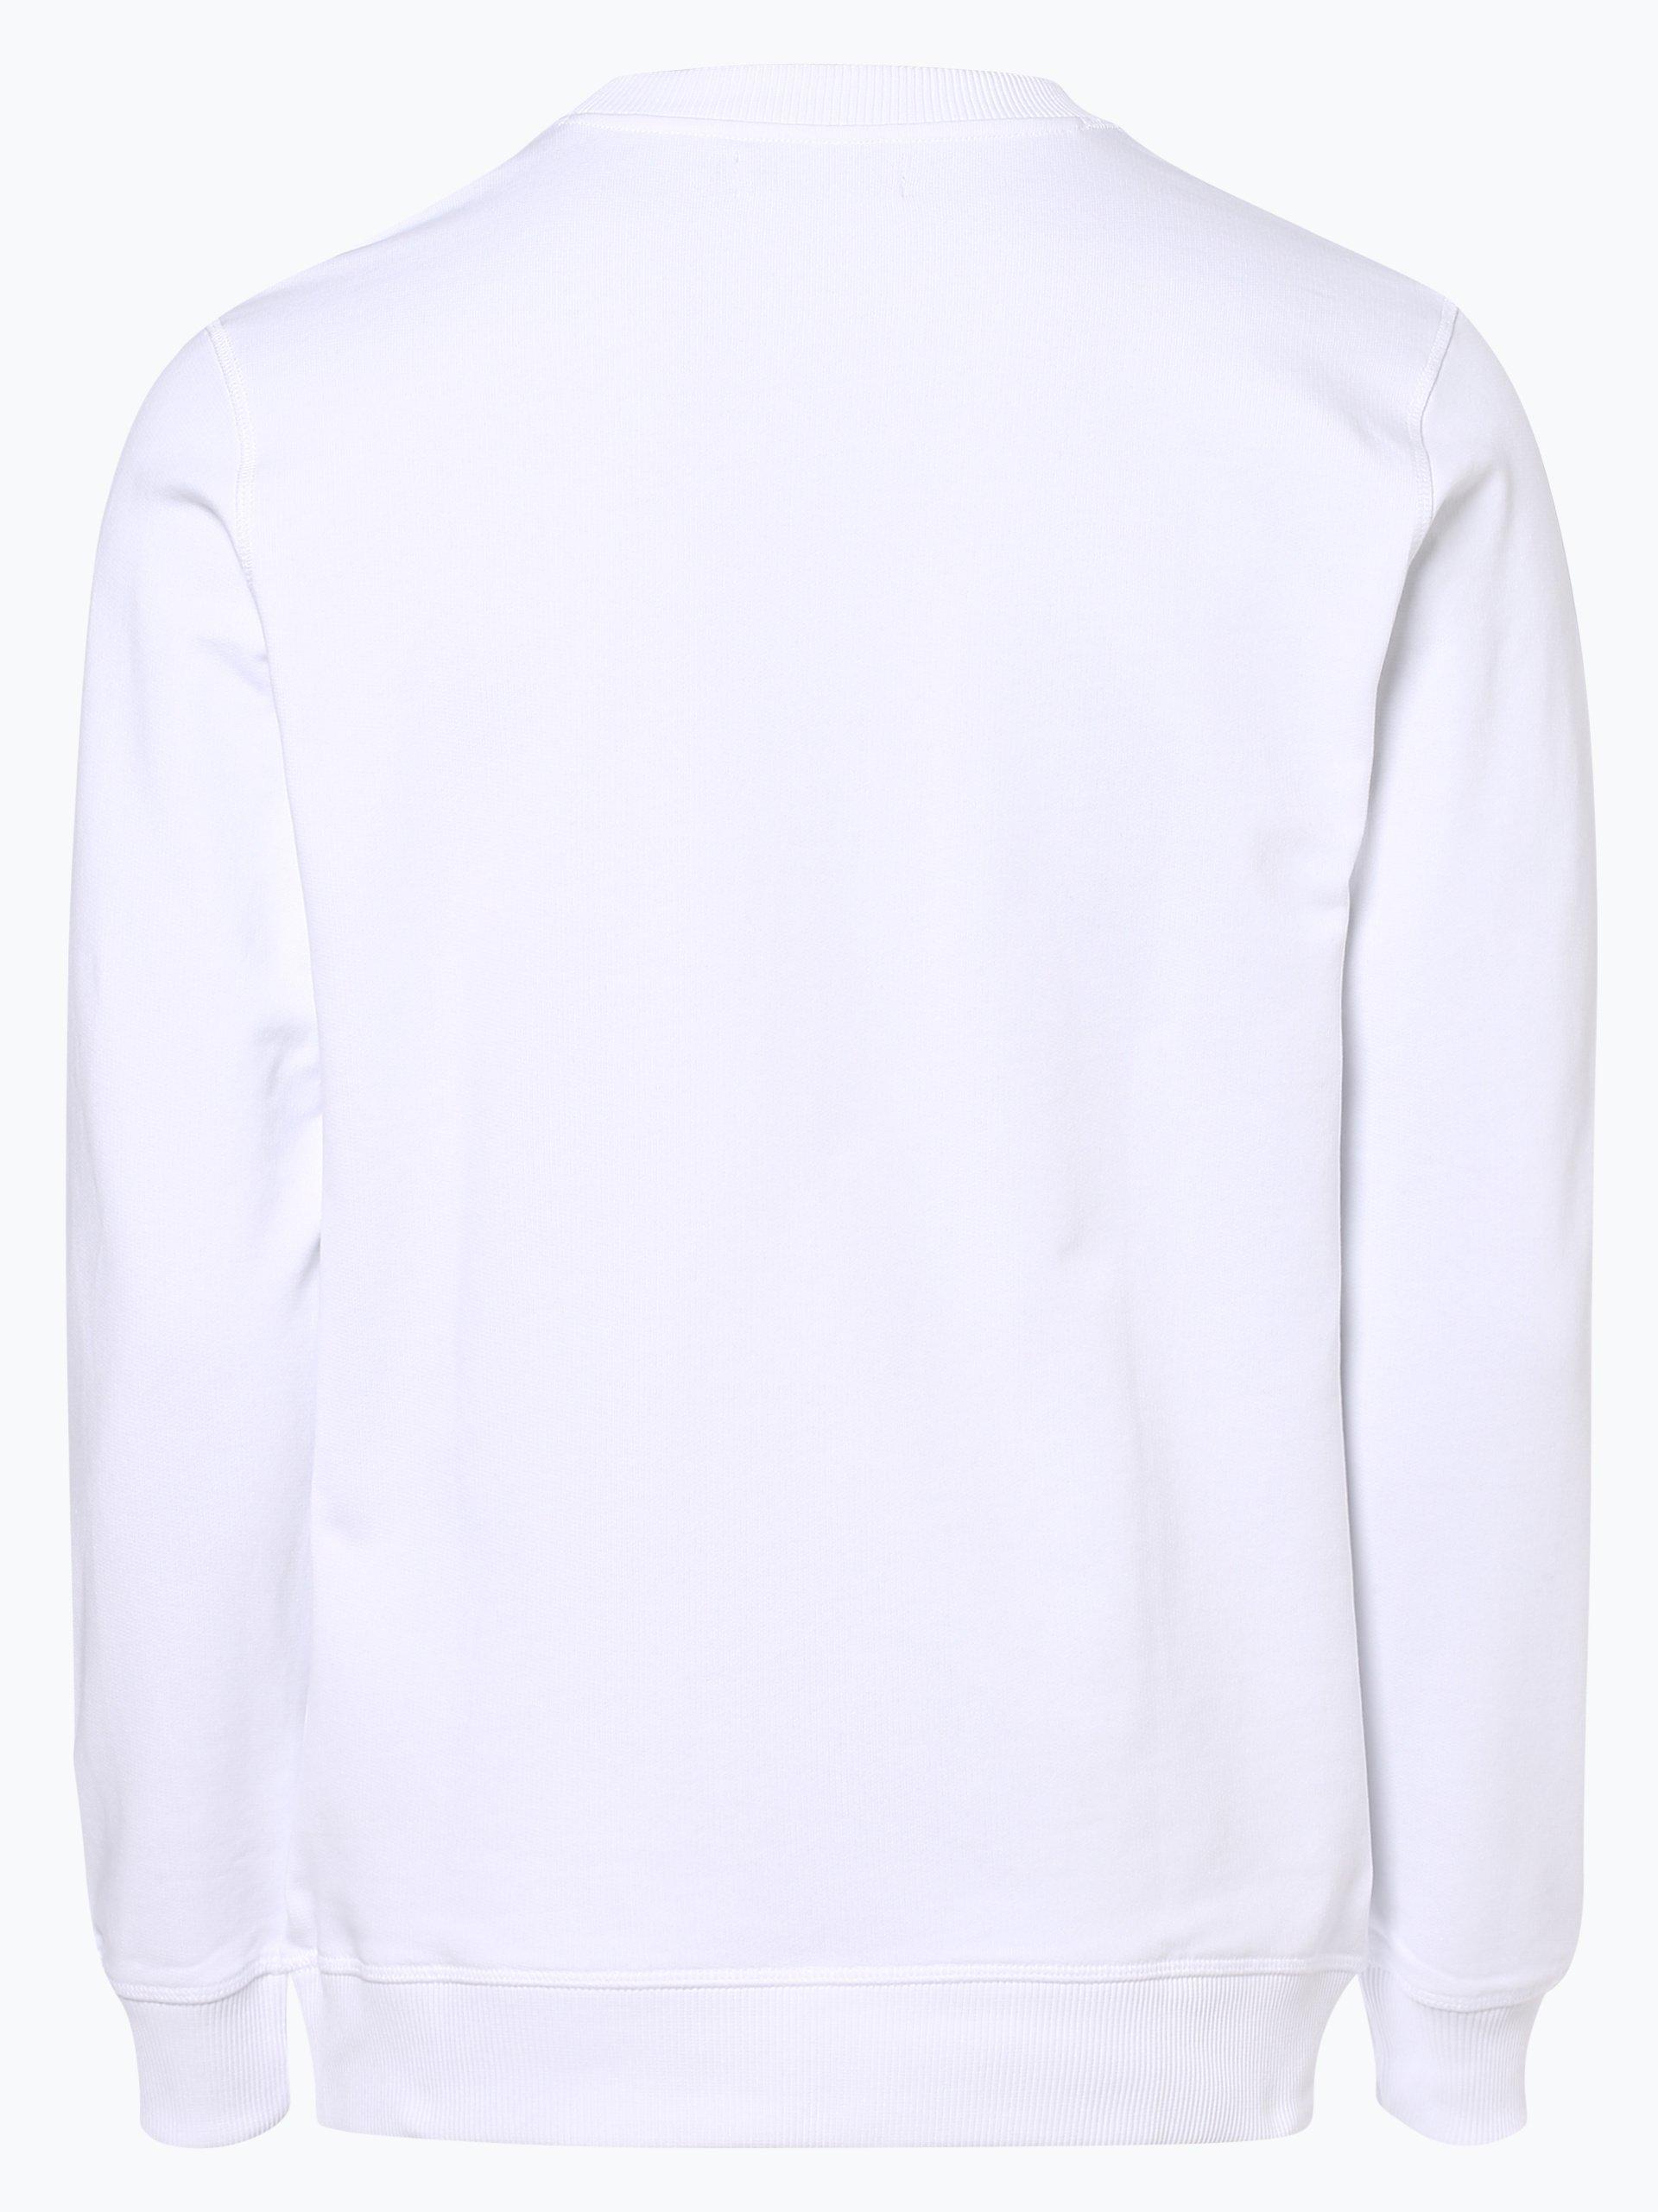 calvin klein jeans herren sweatshirt wei bedruckt online kaufen peek und cloppenburg de. Black Bedroom Furniture Sets. Home Design Ideas